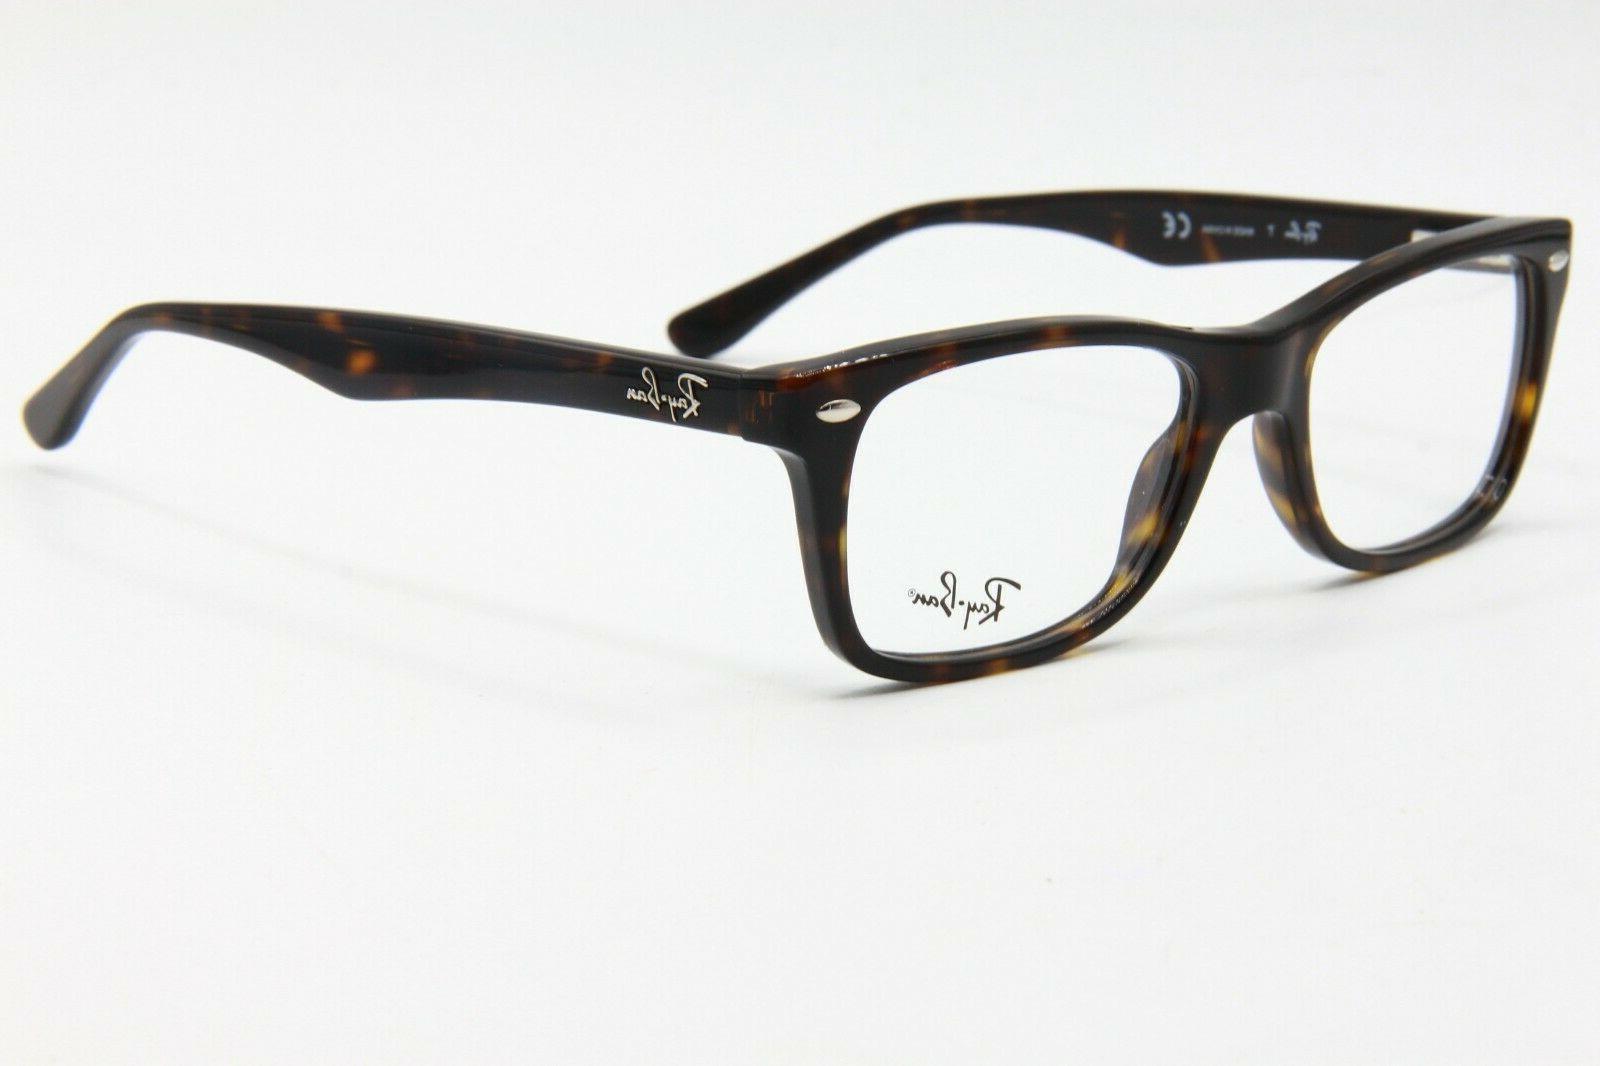 new ray ban rb5228 2012 havana eyeglasses